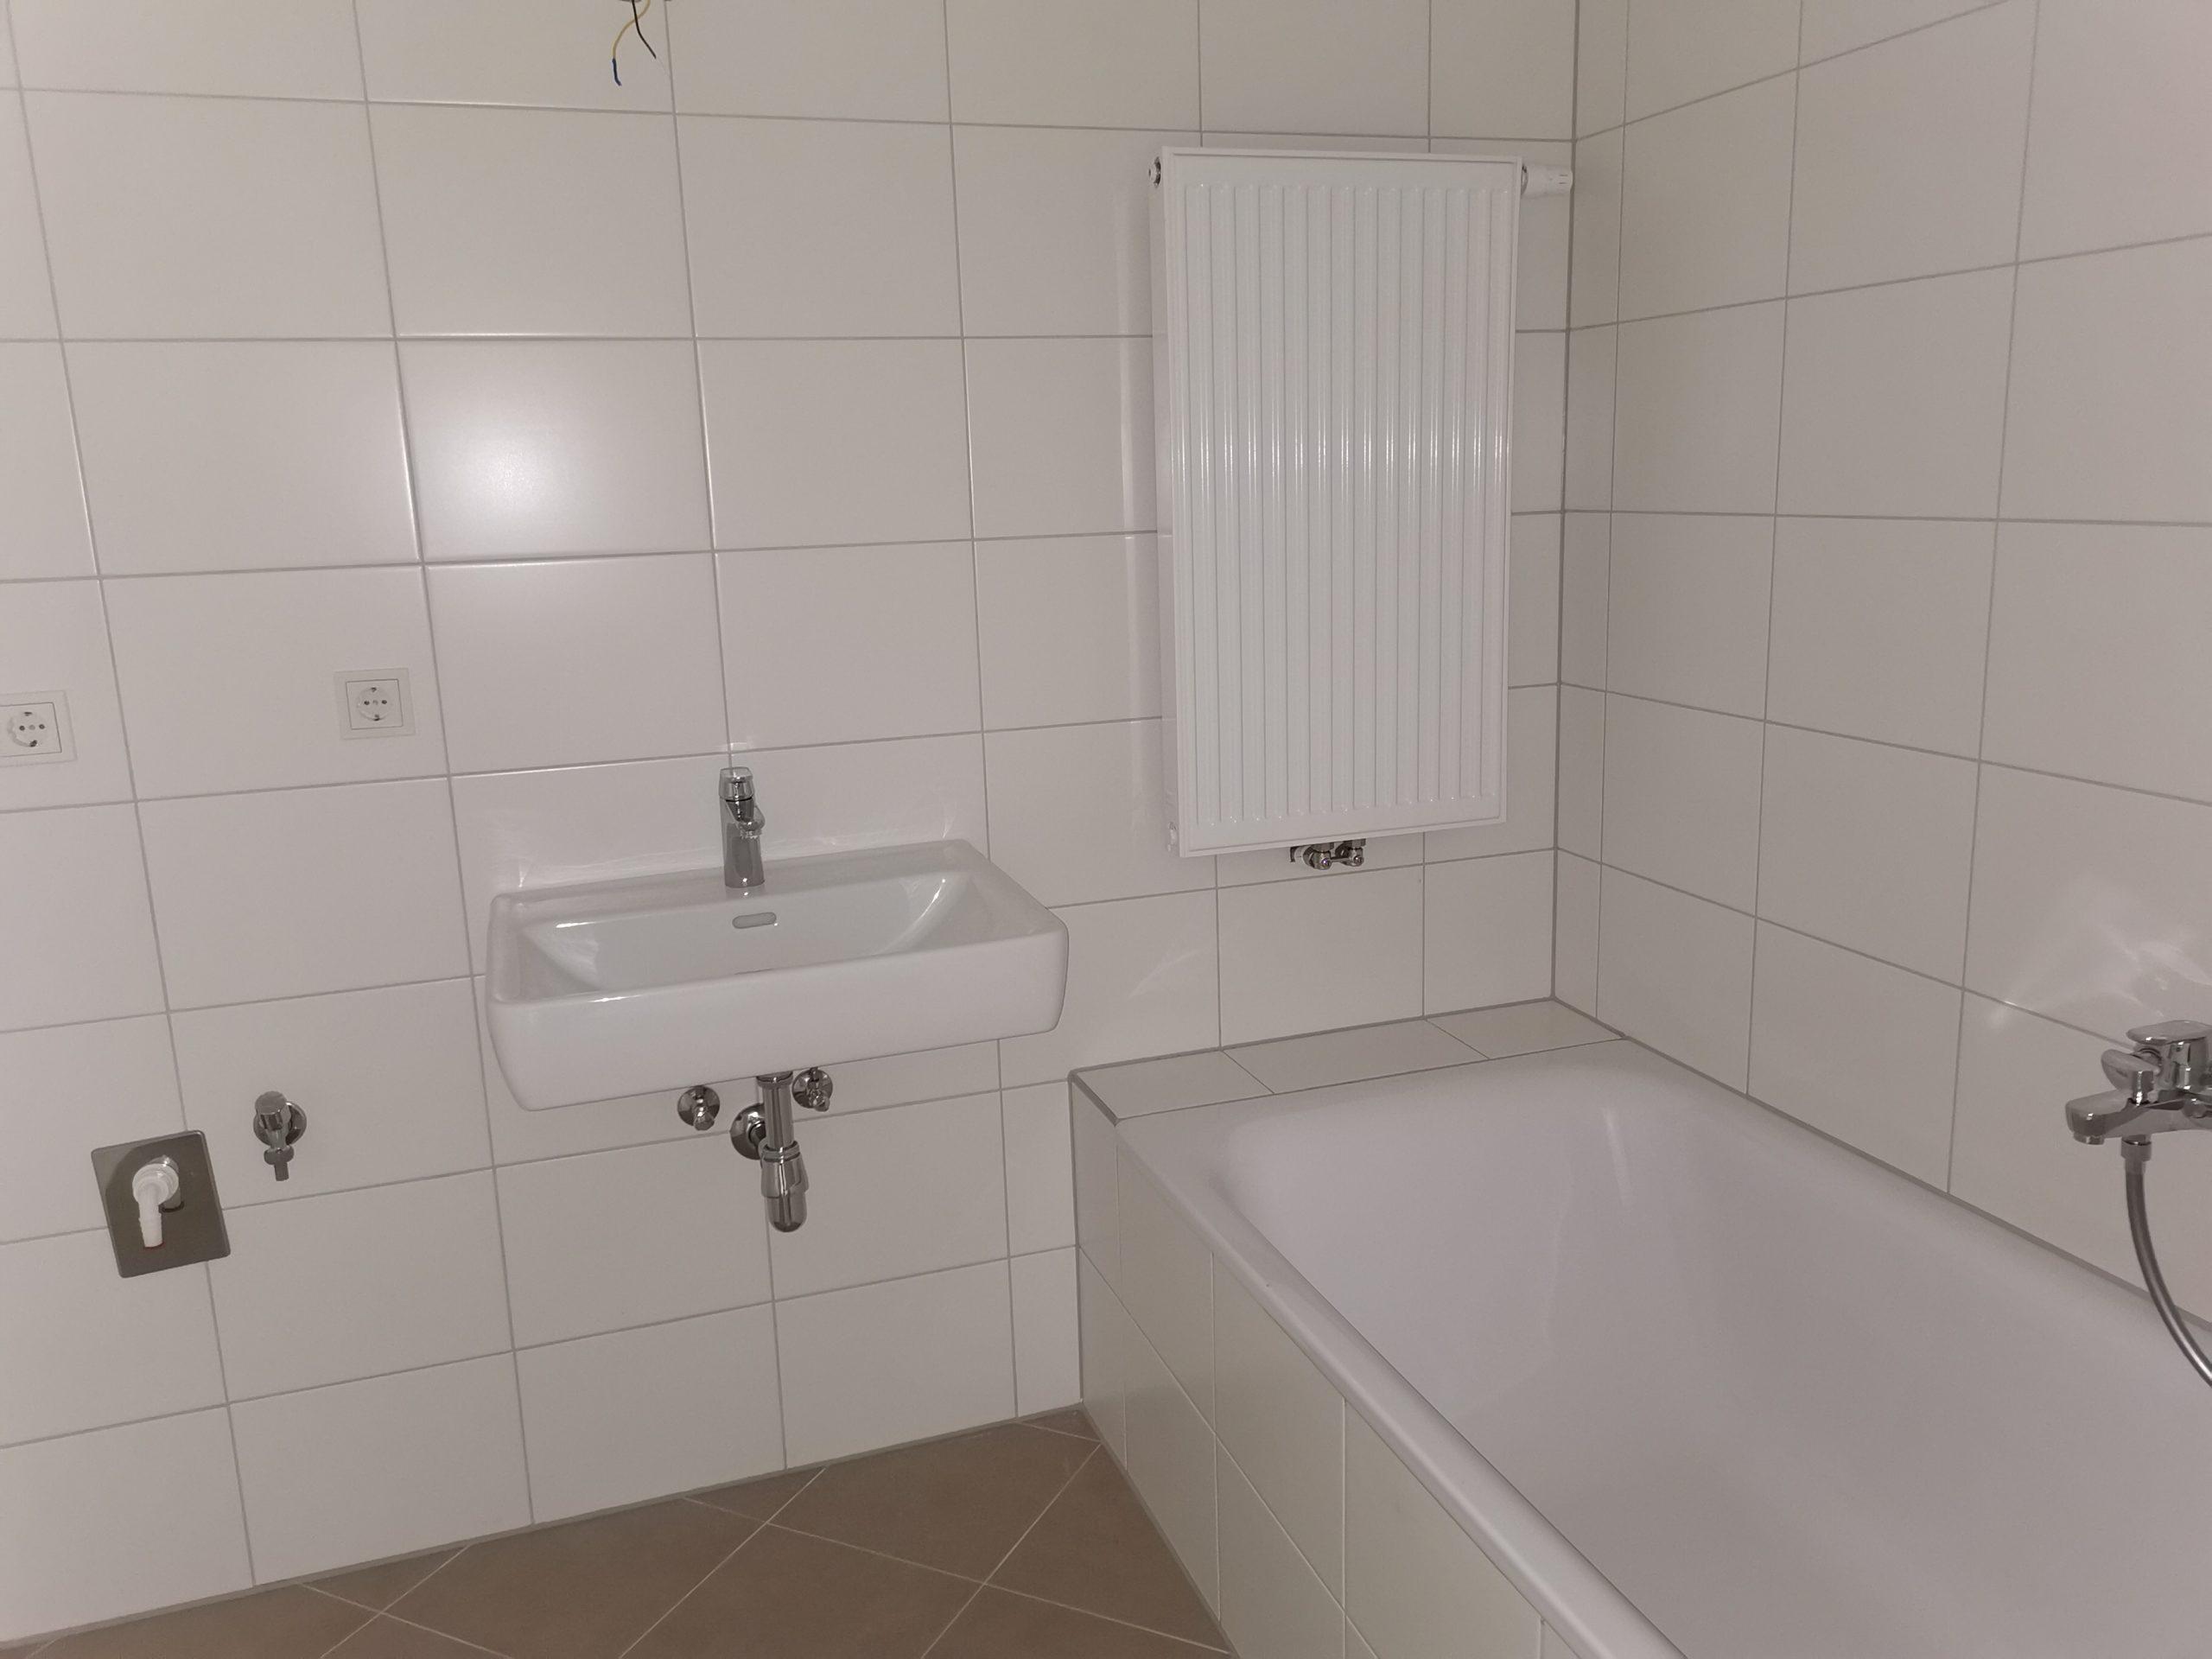 Immobilie von Kamptal in 3730 Eggenburg, Horn, Eggenburg VII - Top 106 #8